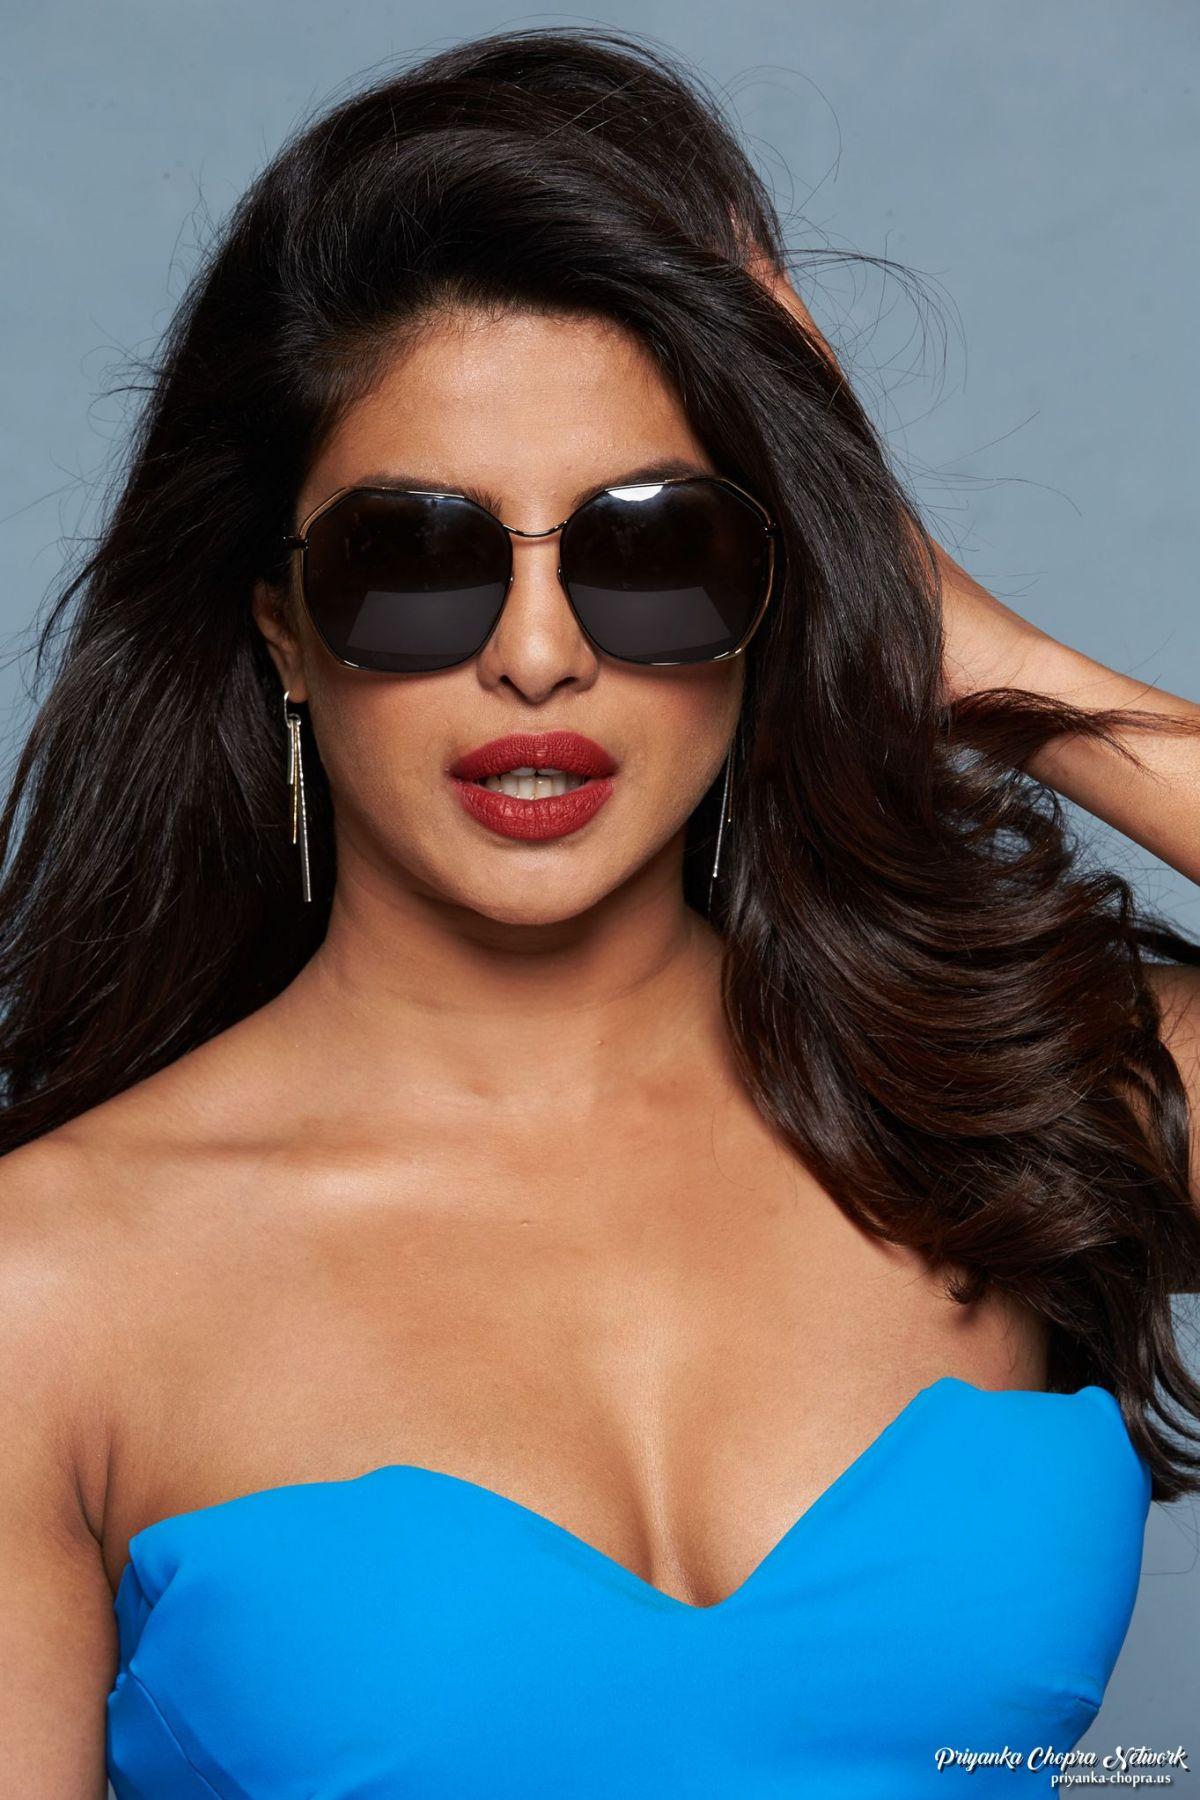 Priyanka Chopra Baywatch Promos Set 5 9 Hawtcelebs